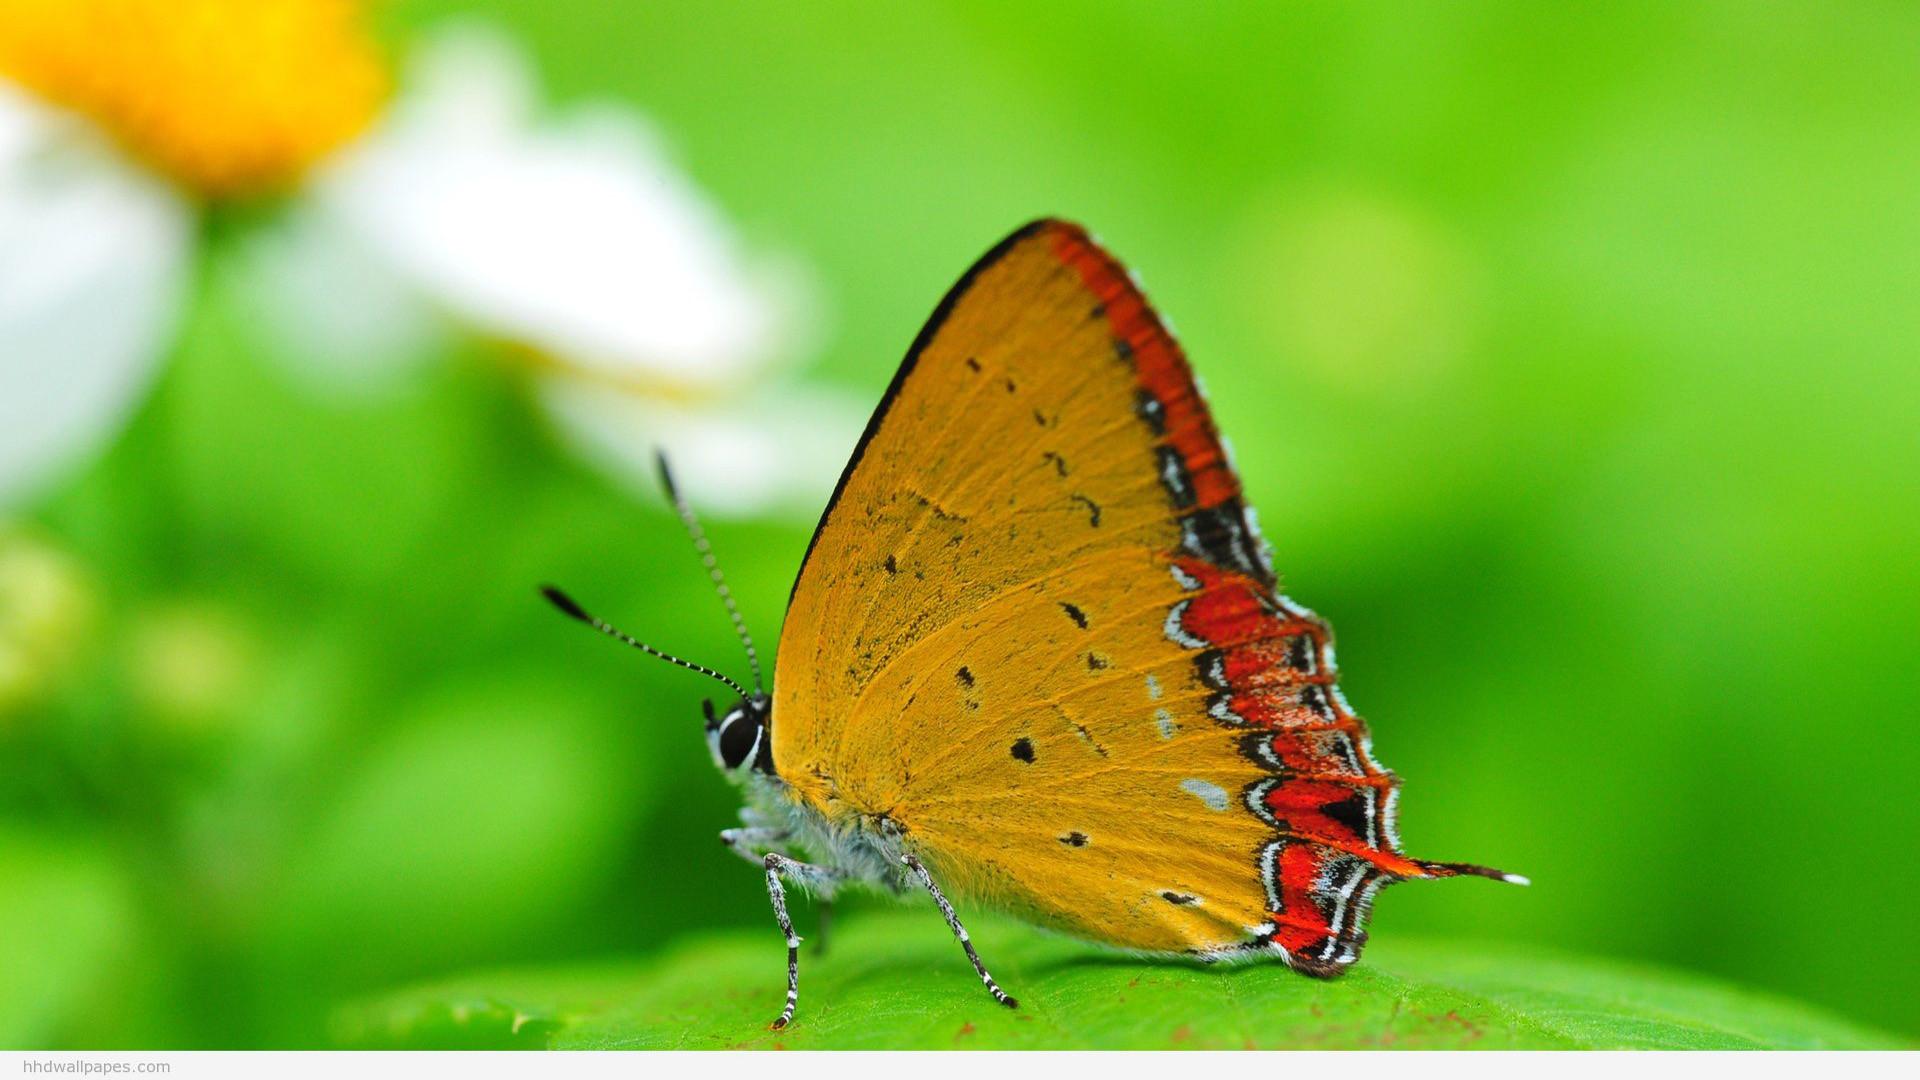 … Full HD Nature Wallpapers 1080p Desktop with Macro Photo of .